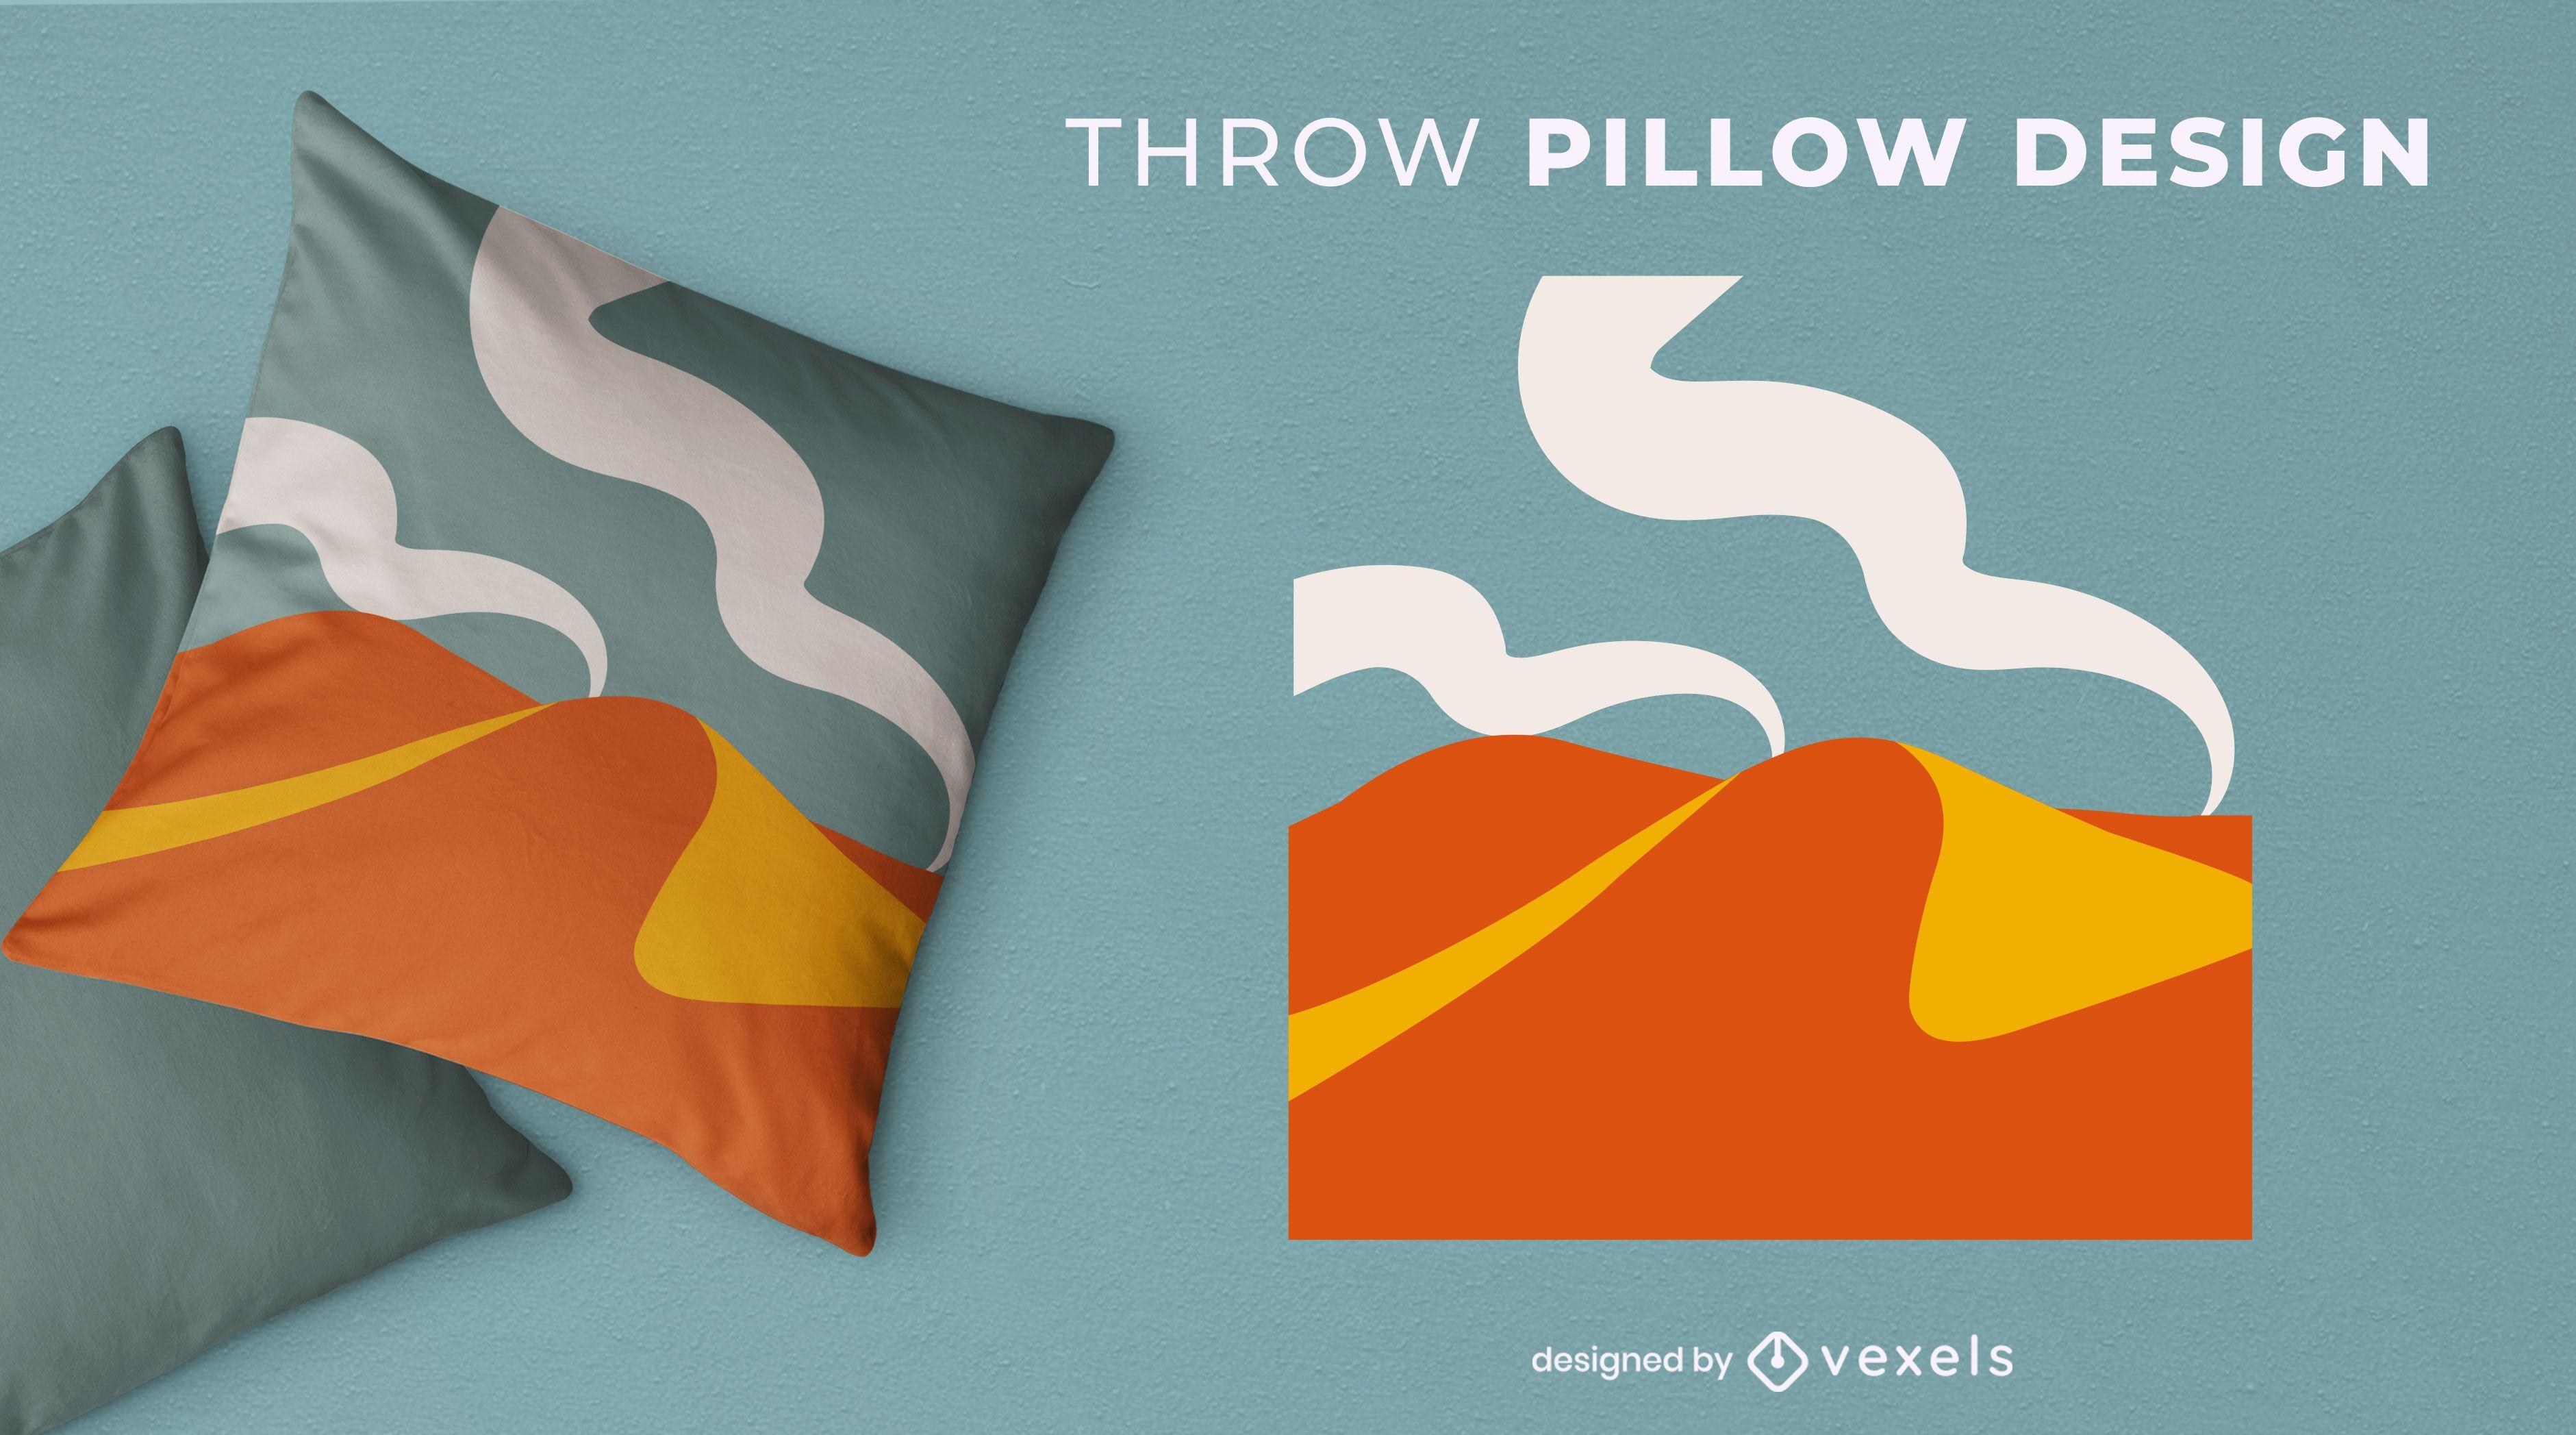 Artistic throw pillow design